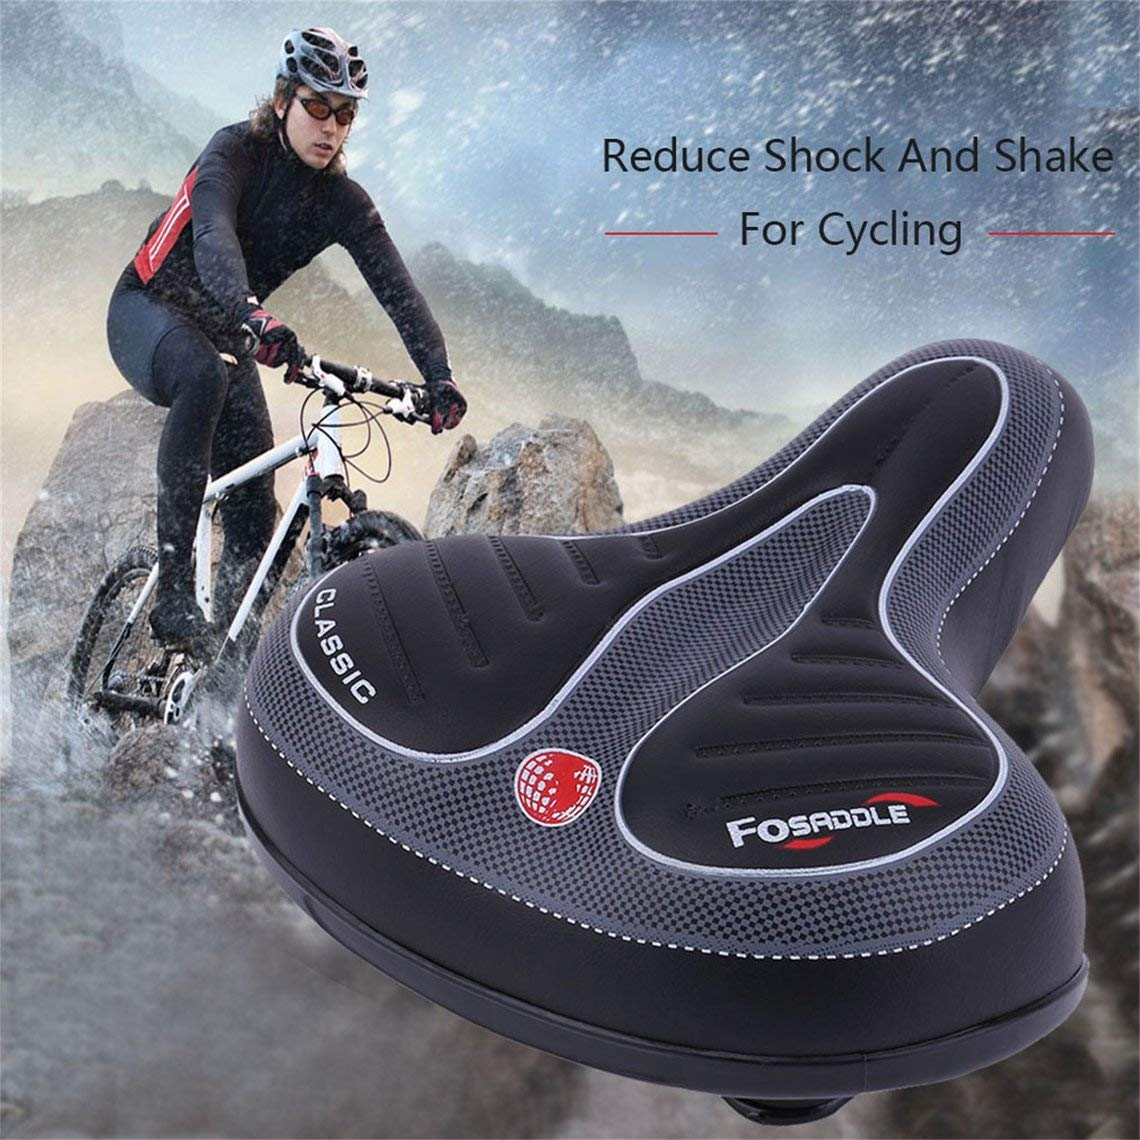 Bike Bicycle Saddle Seat Cover Comfort Sporty Soft Pad Wide Big Bum Gel US